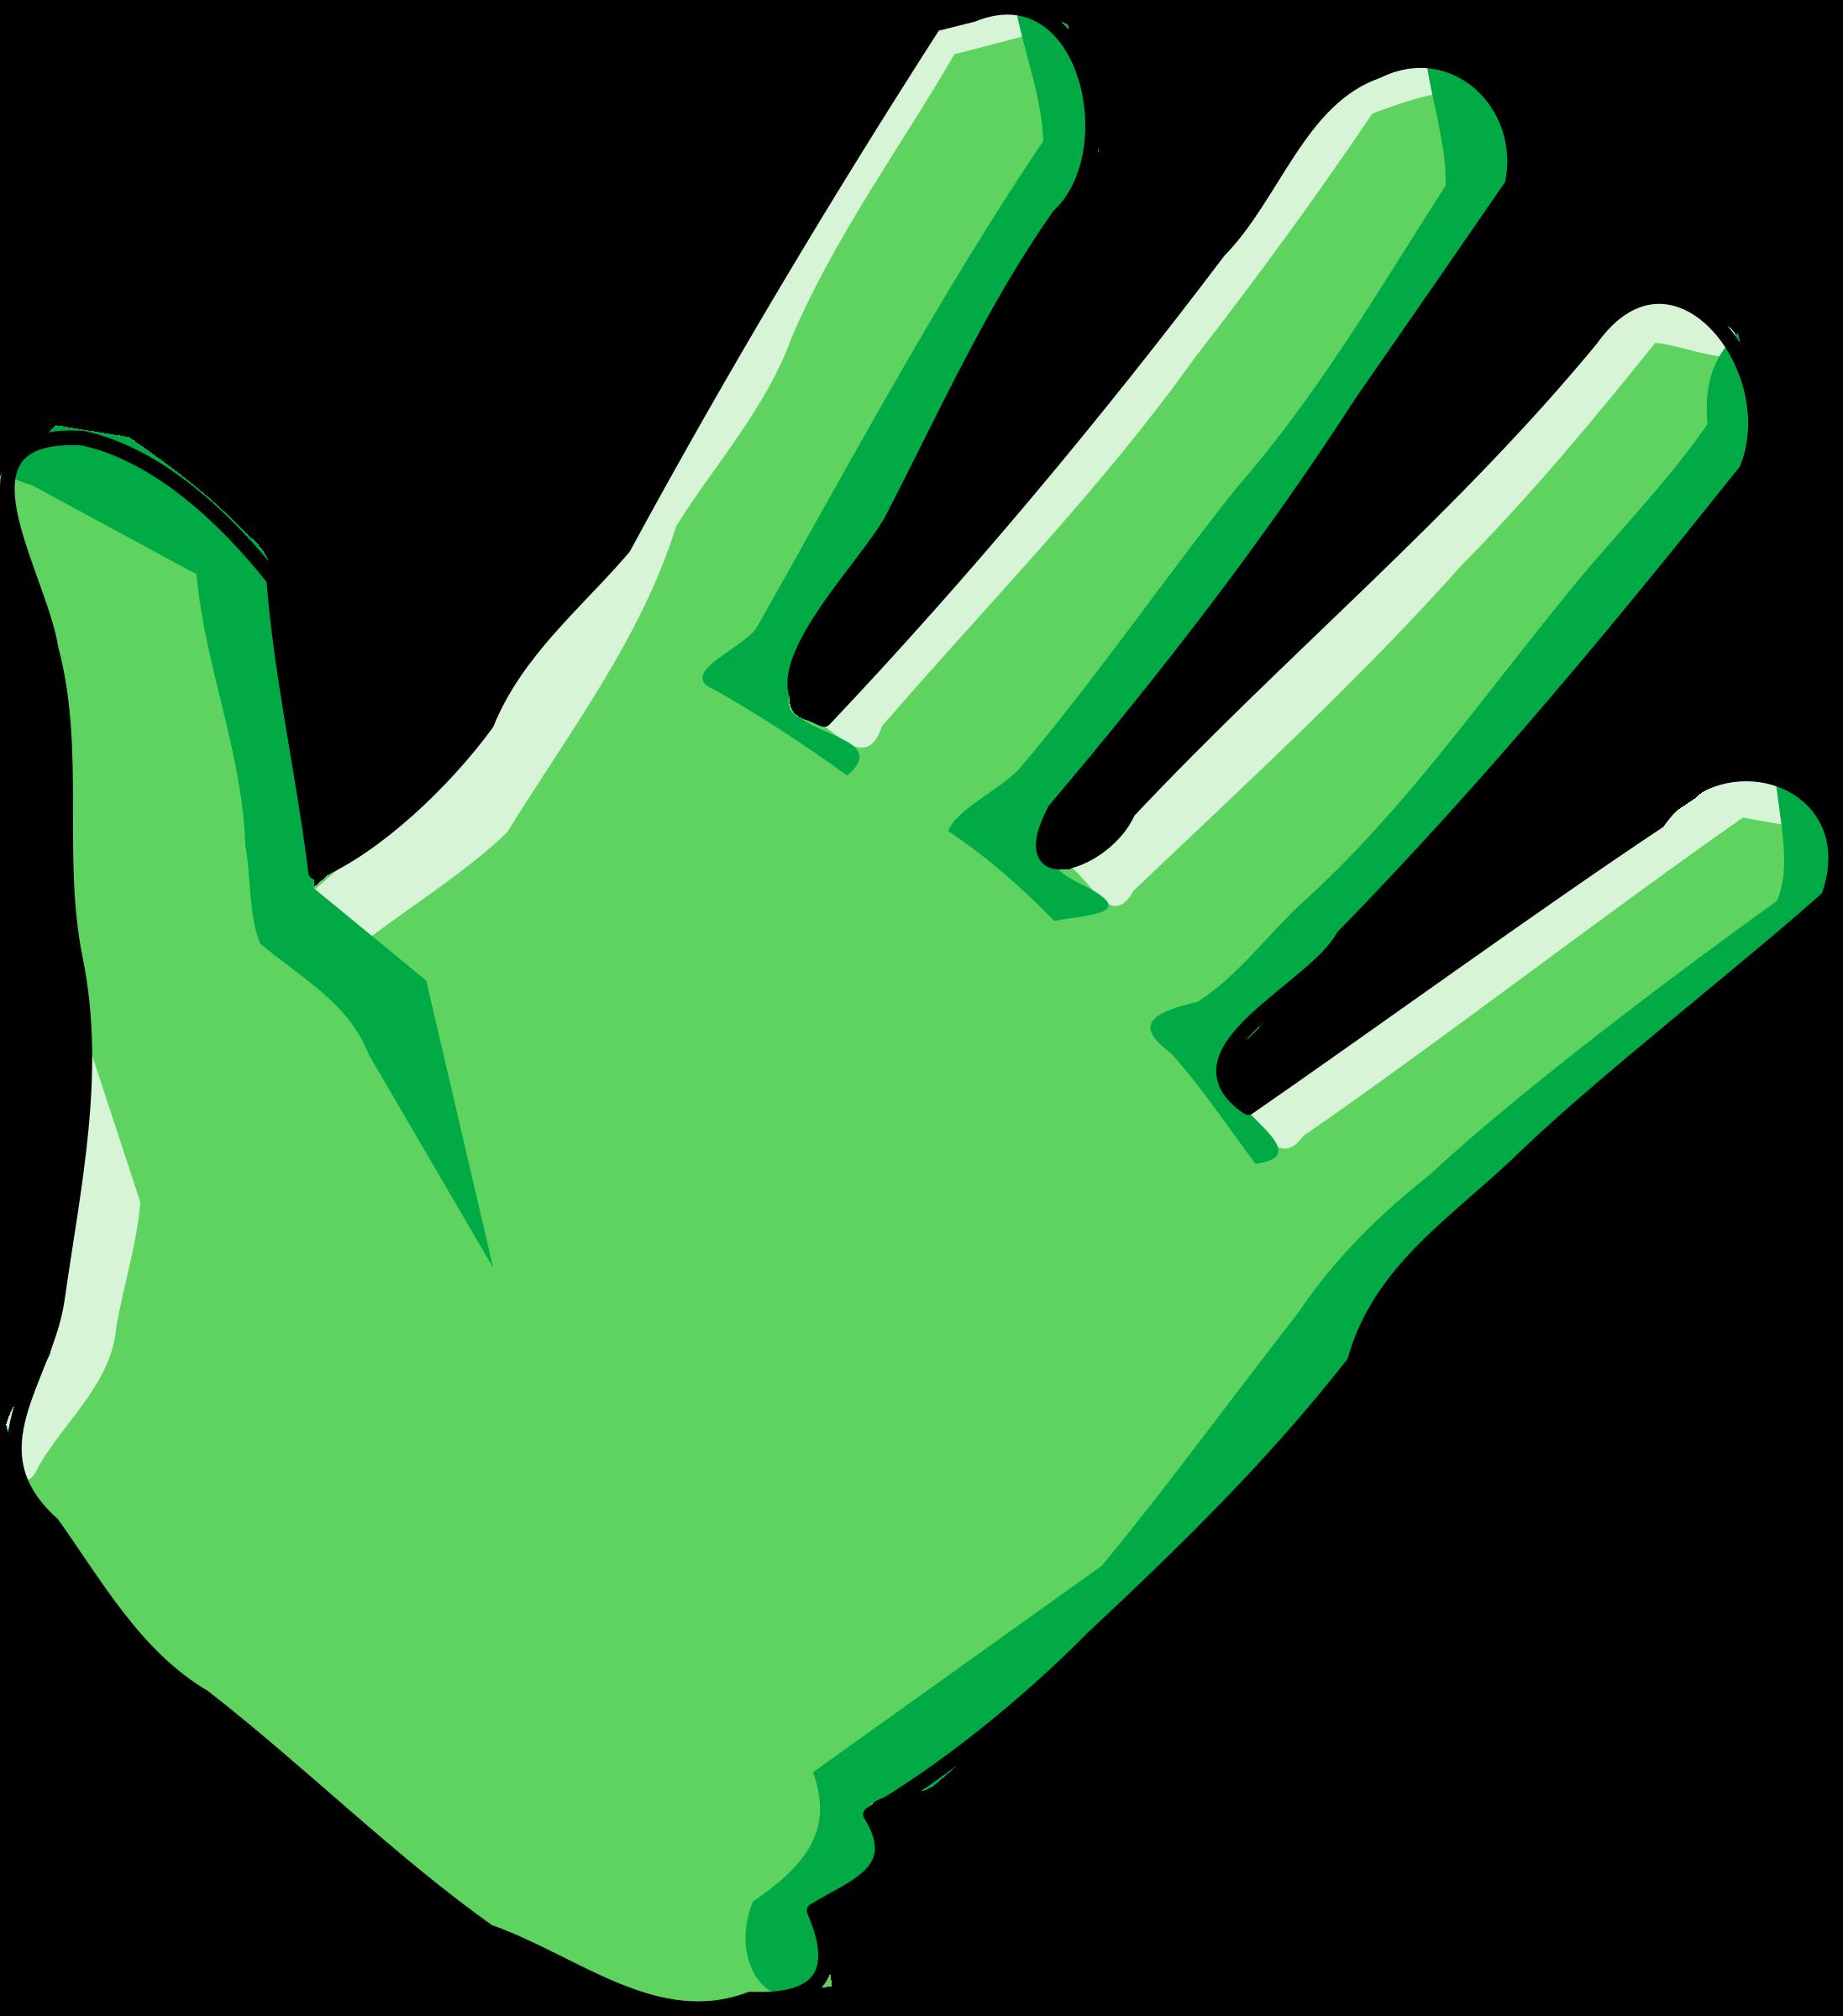 Glove Clip Art.